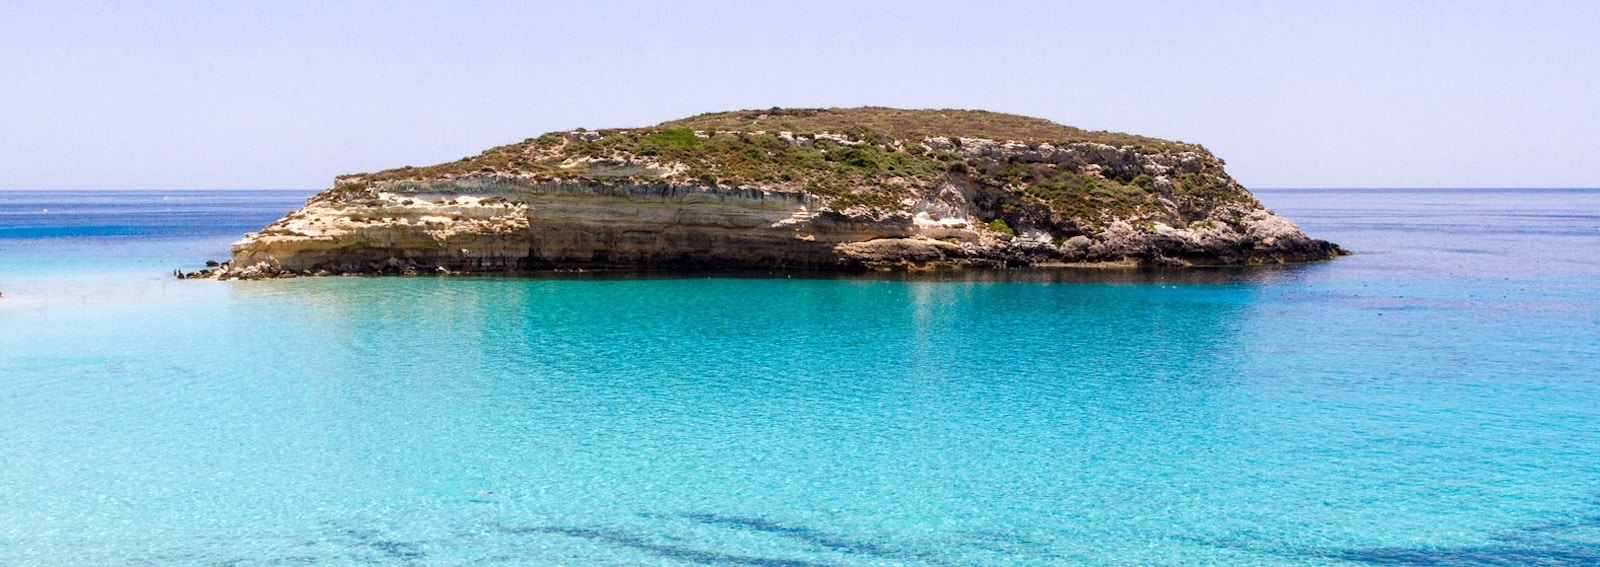 crystalline water surface around an island (Lampedusa)